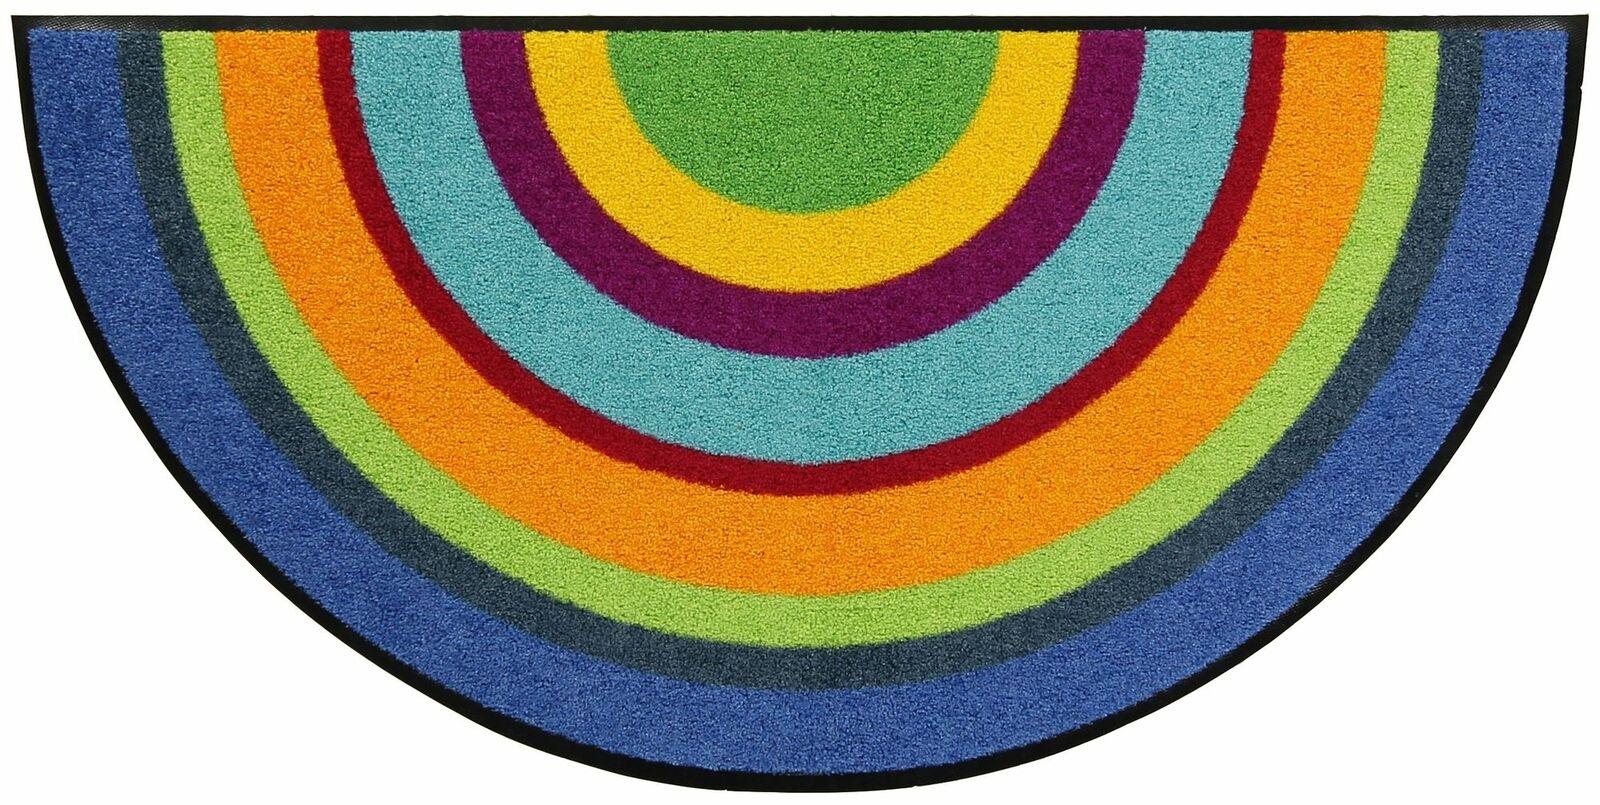 Leoni Tappetino Varberg semicircolare 50 x 100 cm Lavabile Tappetino Sporco